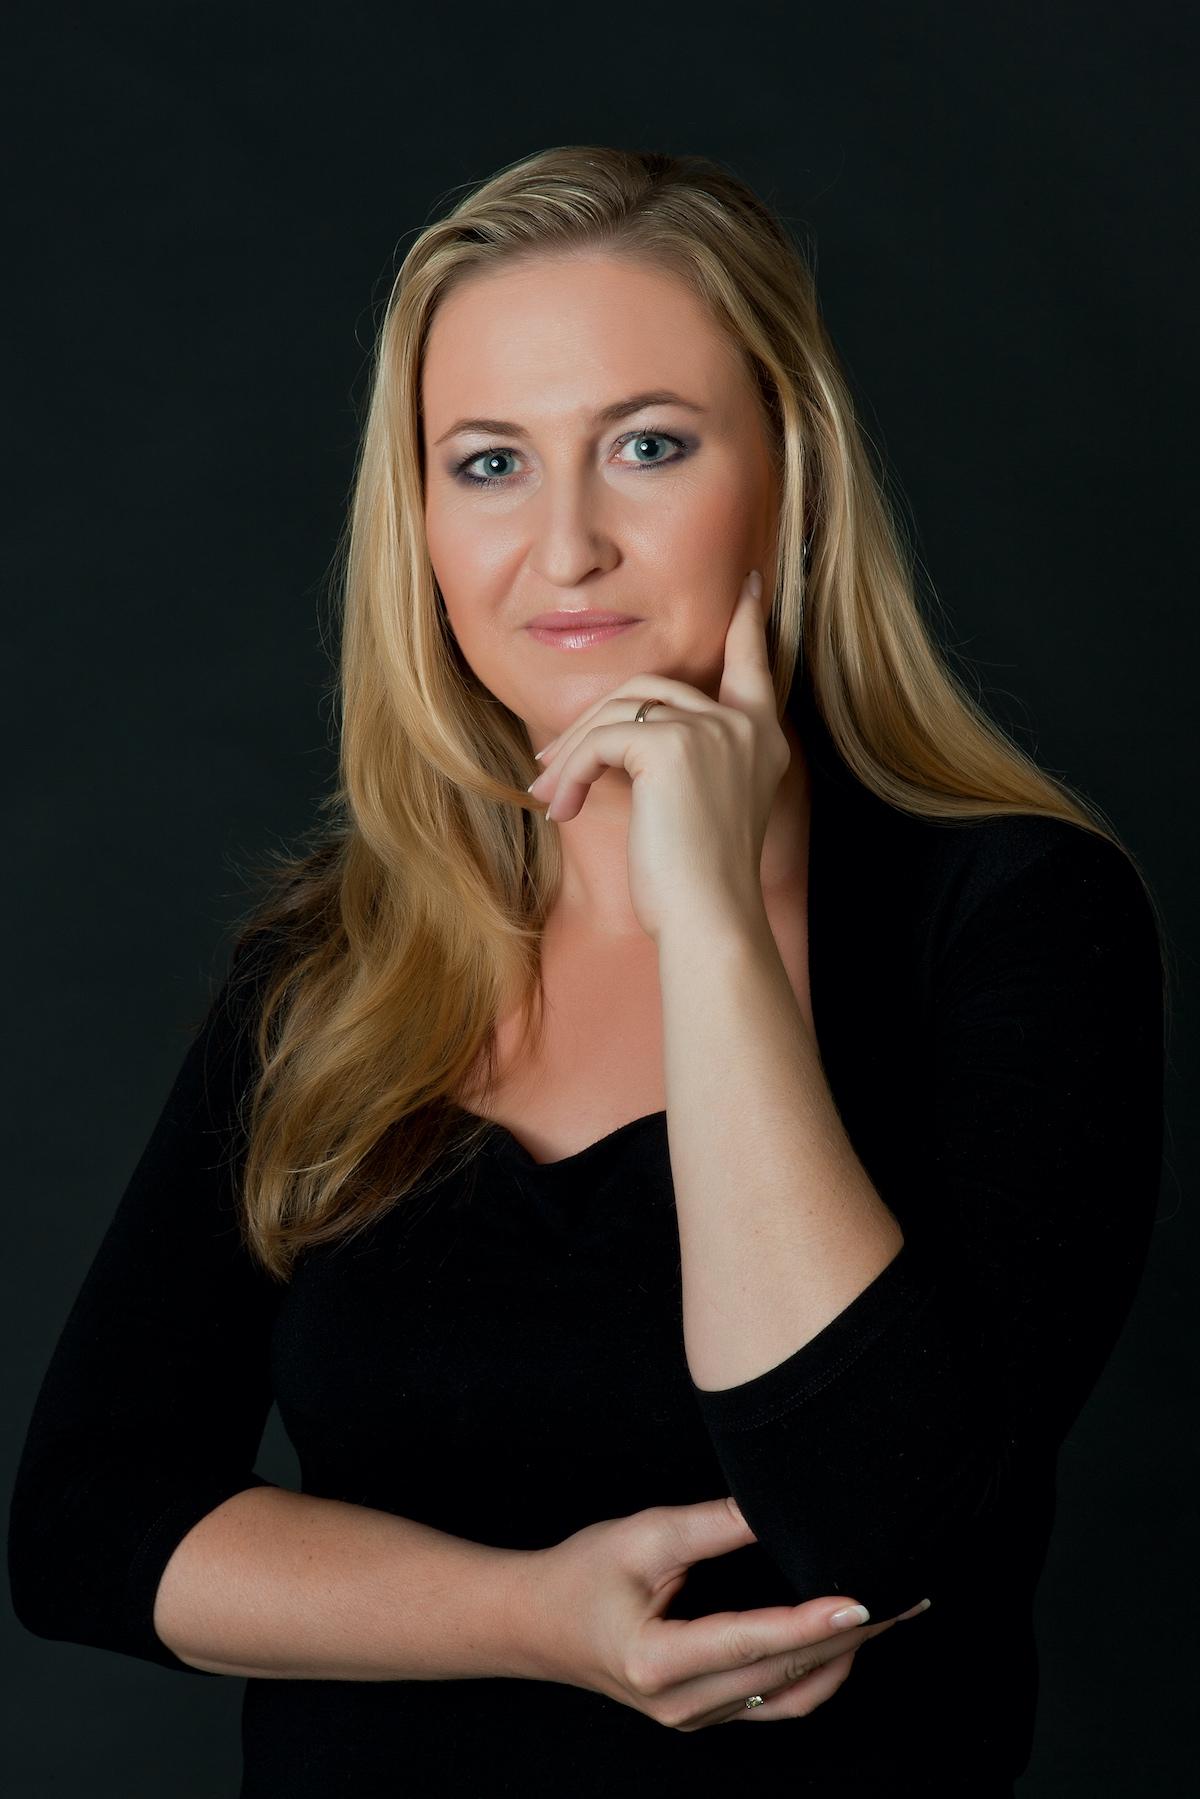 Lucie Češpivová